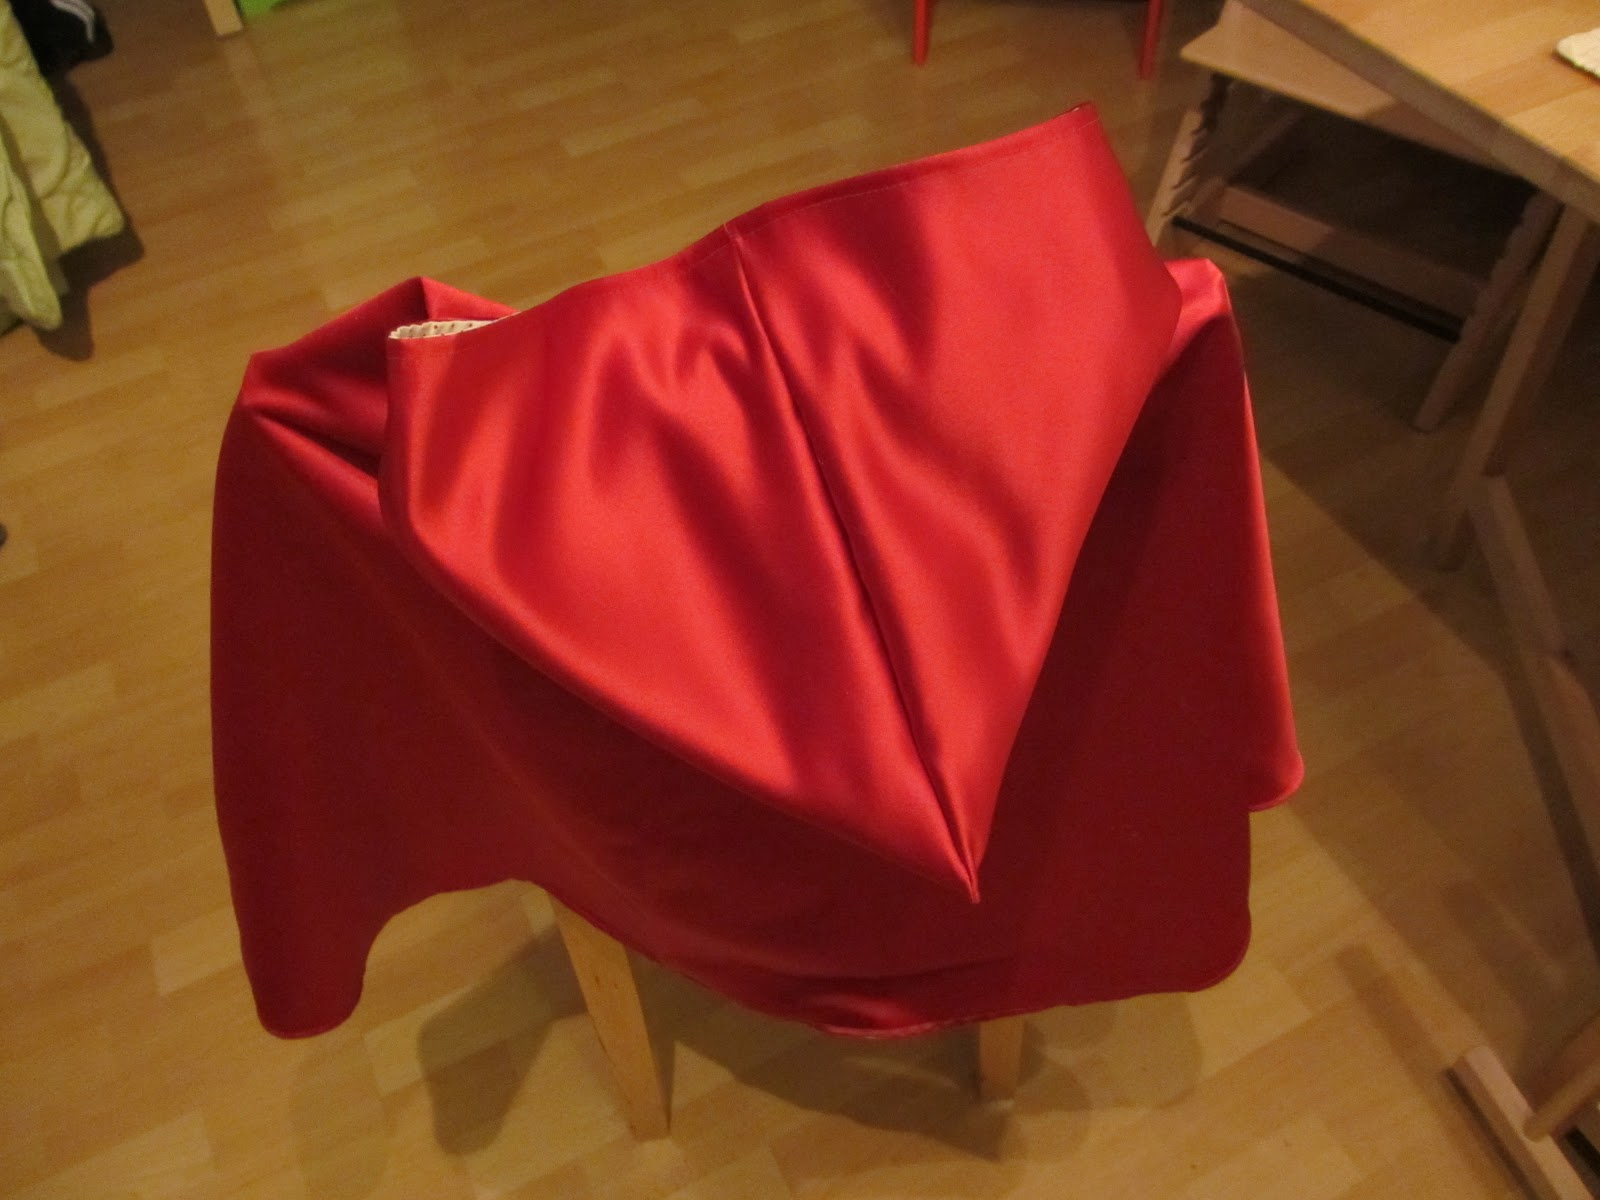 Catlog: Rotkäppchenumhang